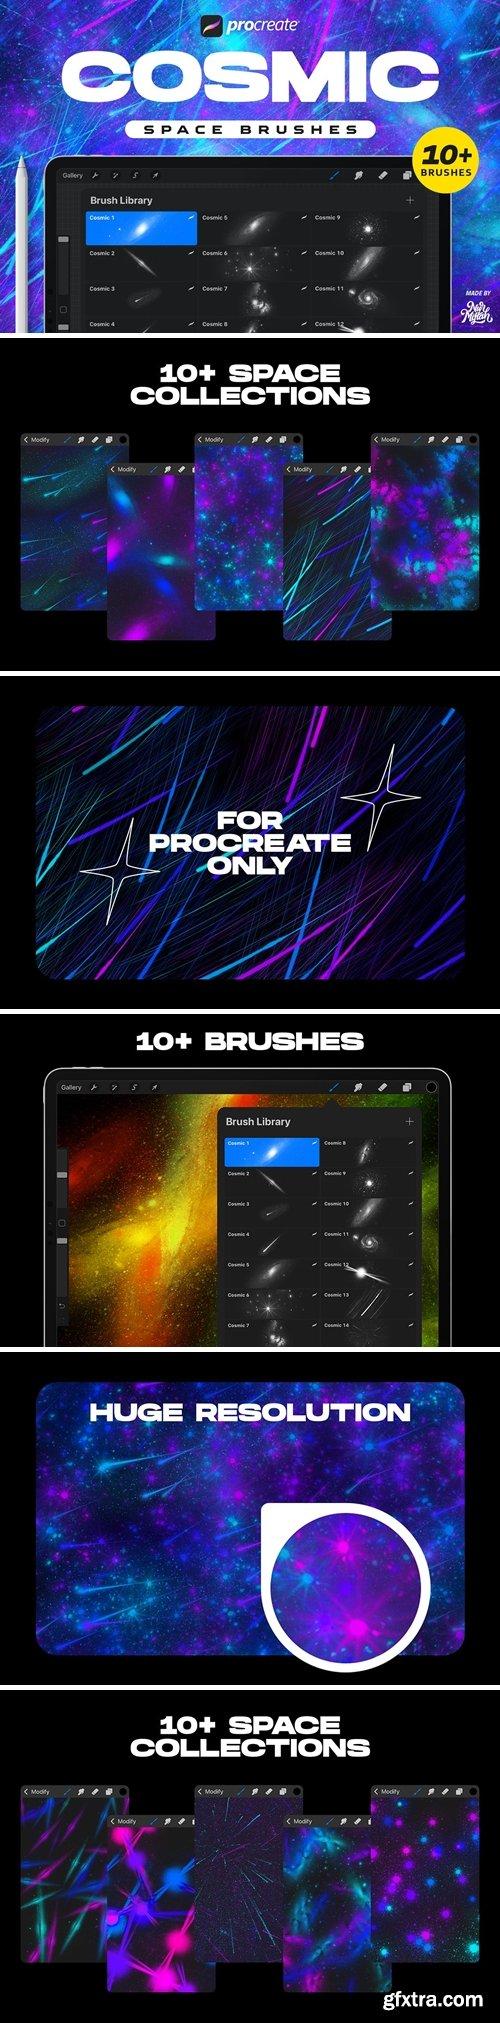 Procreate Cosmic Space Brushes